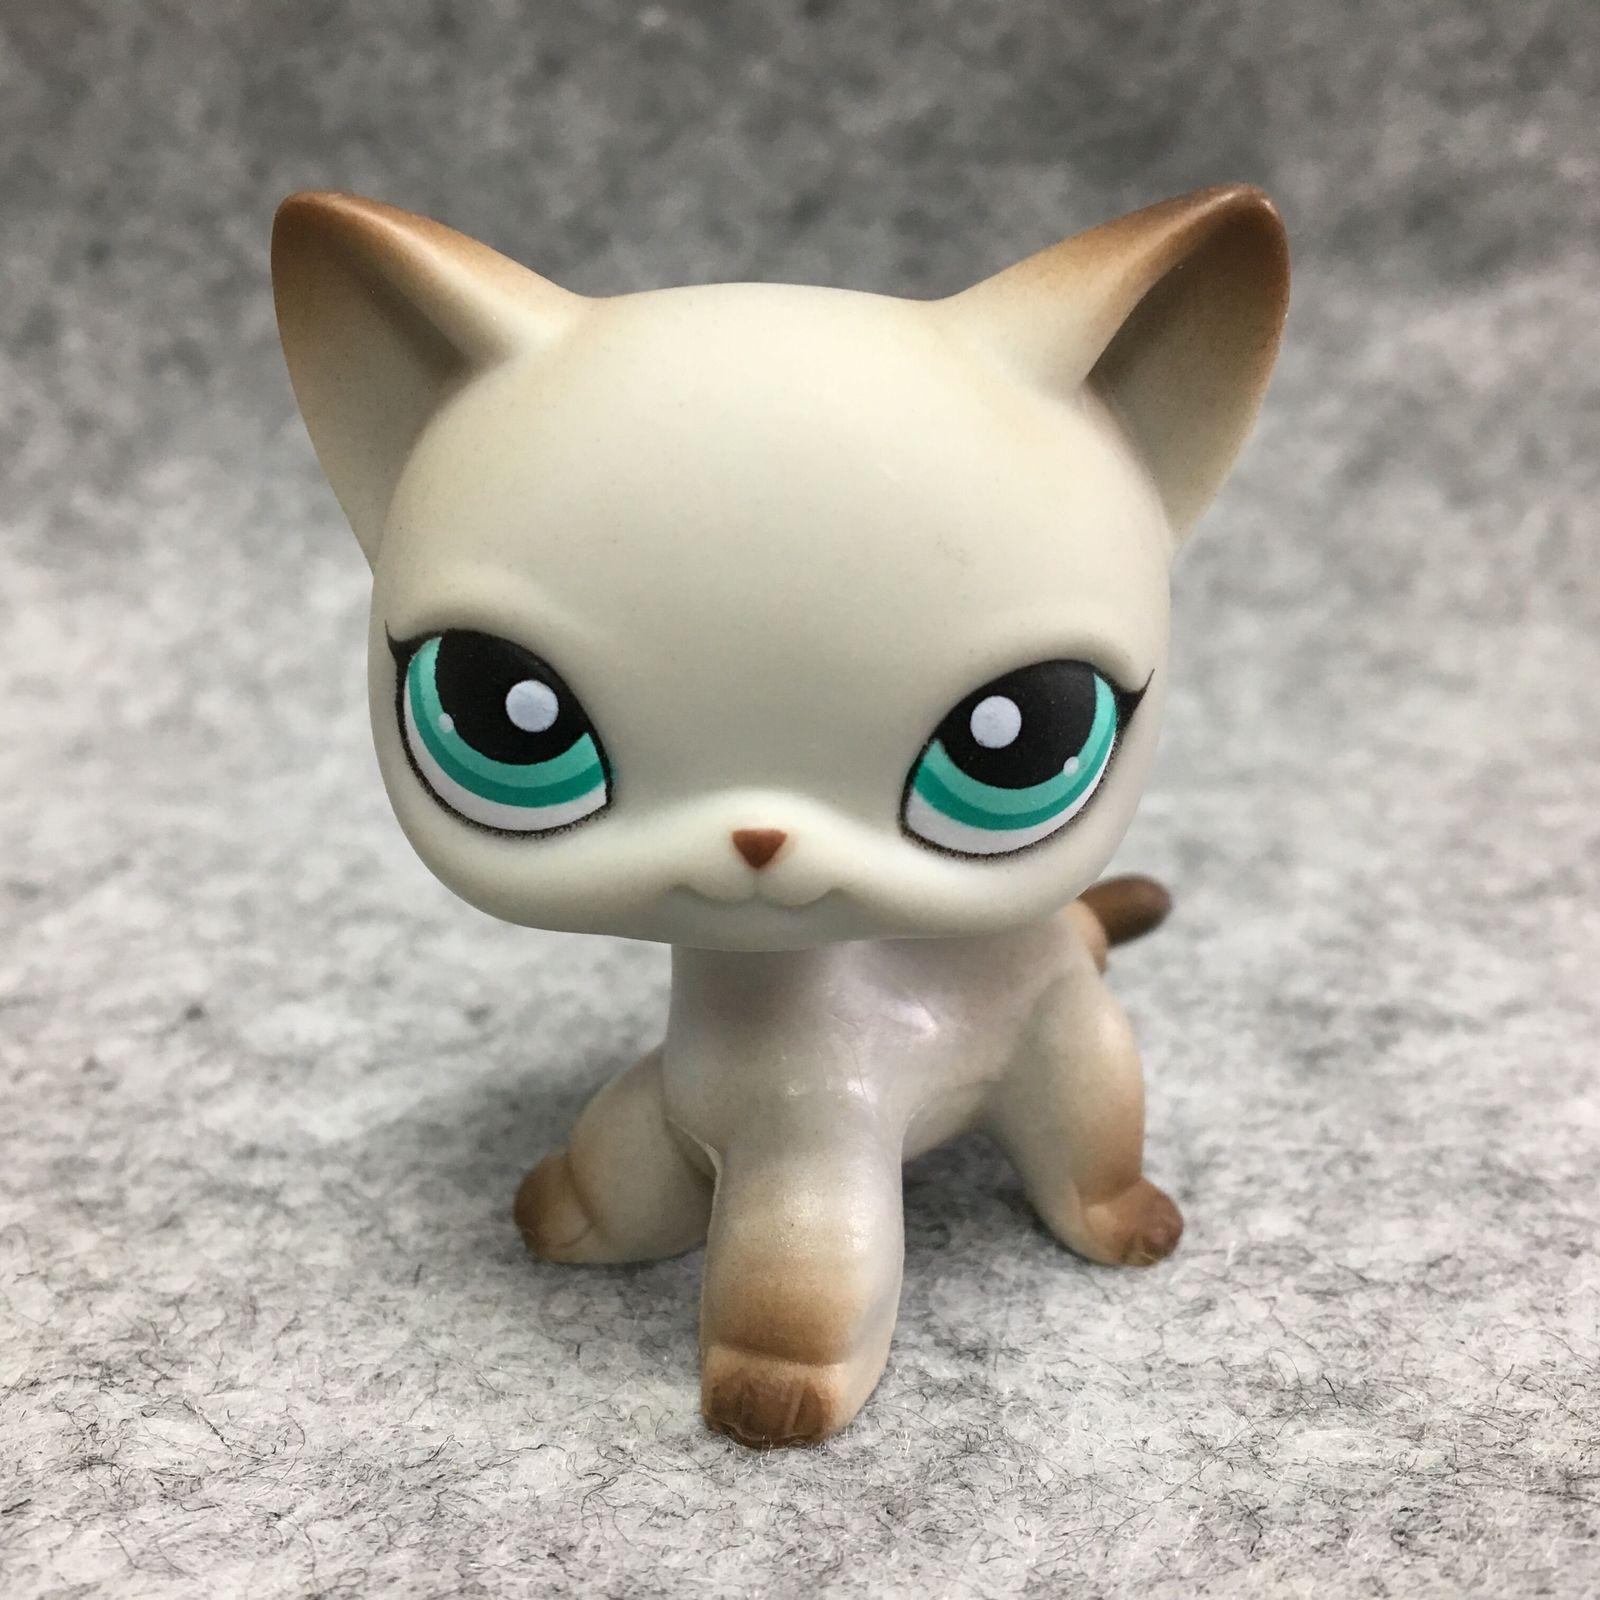 3 99 Littlest Pet Shop Animals Lps Toy 391 Grey Short Hair Cat Figure D Littlest Shop Animals Grey Short Hair Fig Pet Shop Little Pets Lps Pets